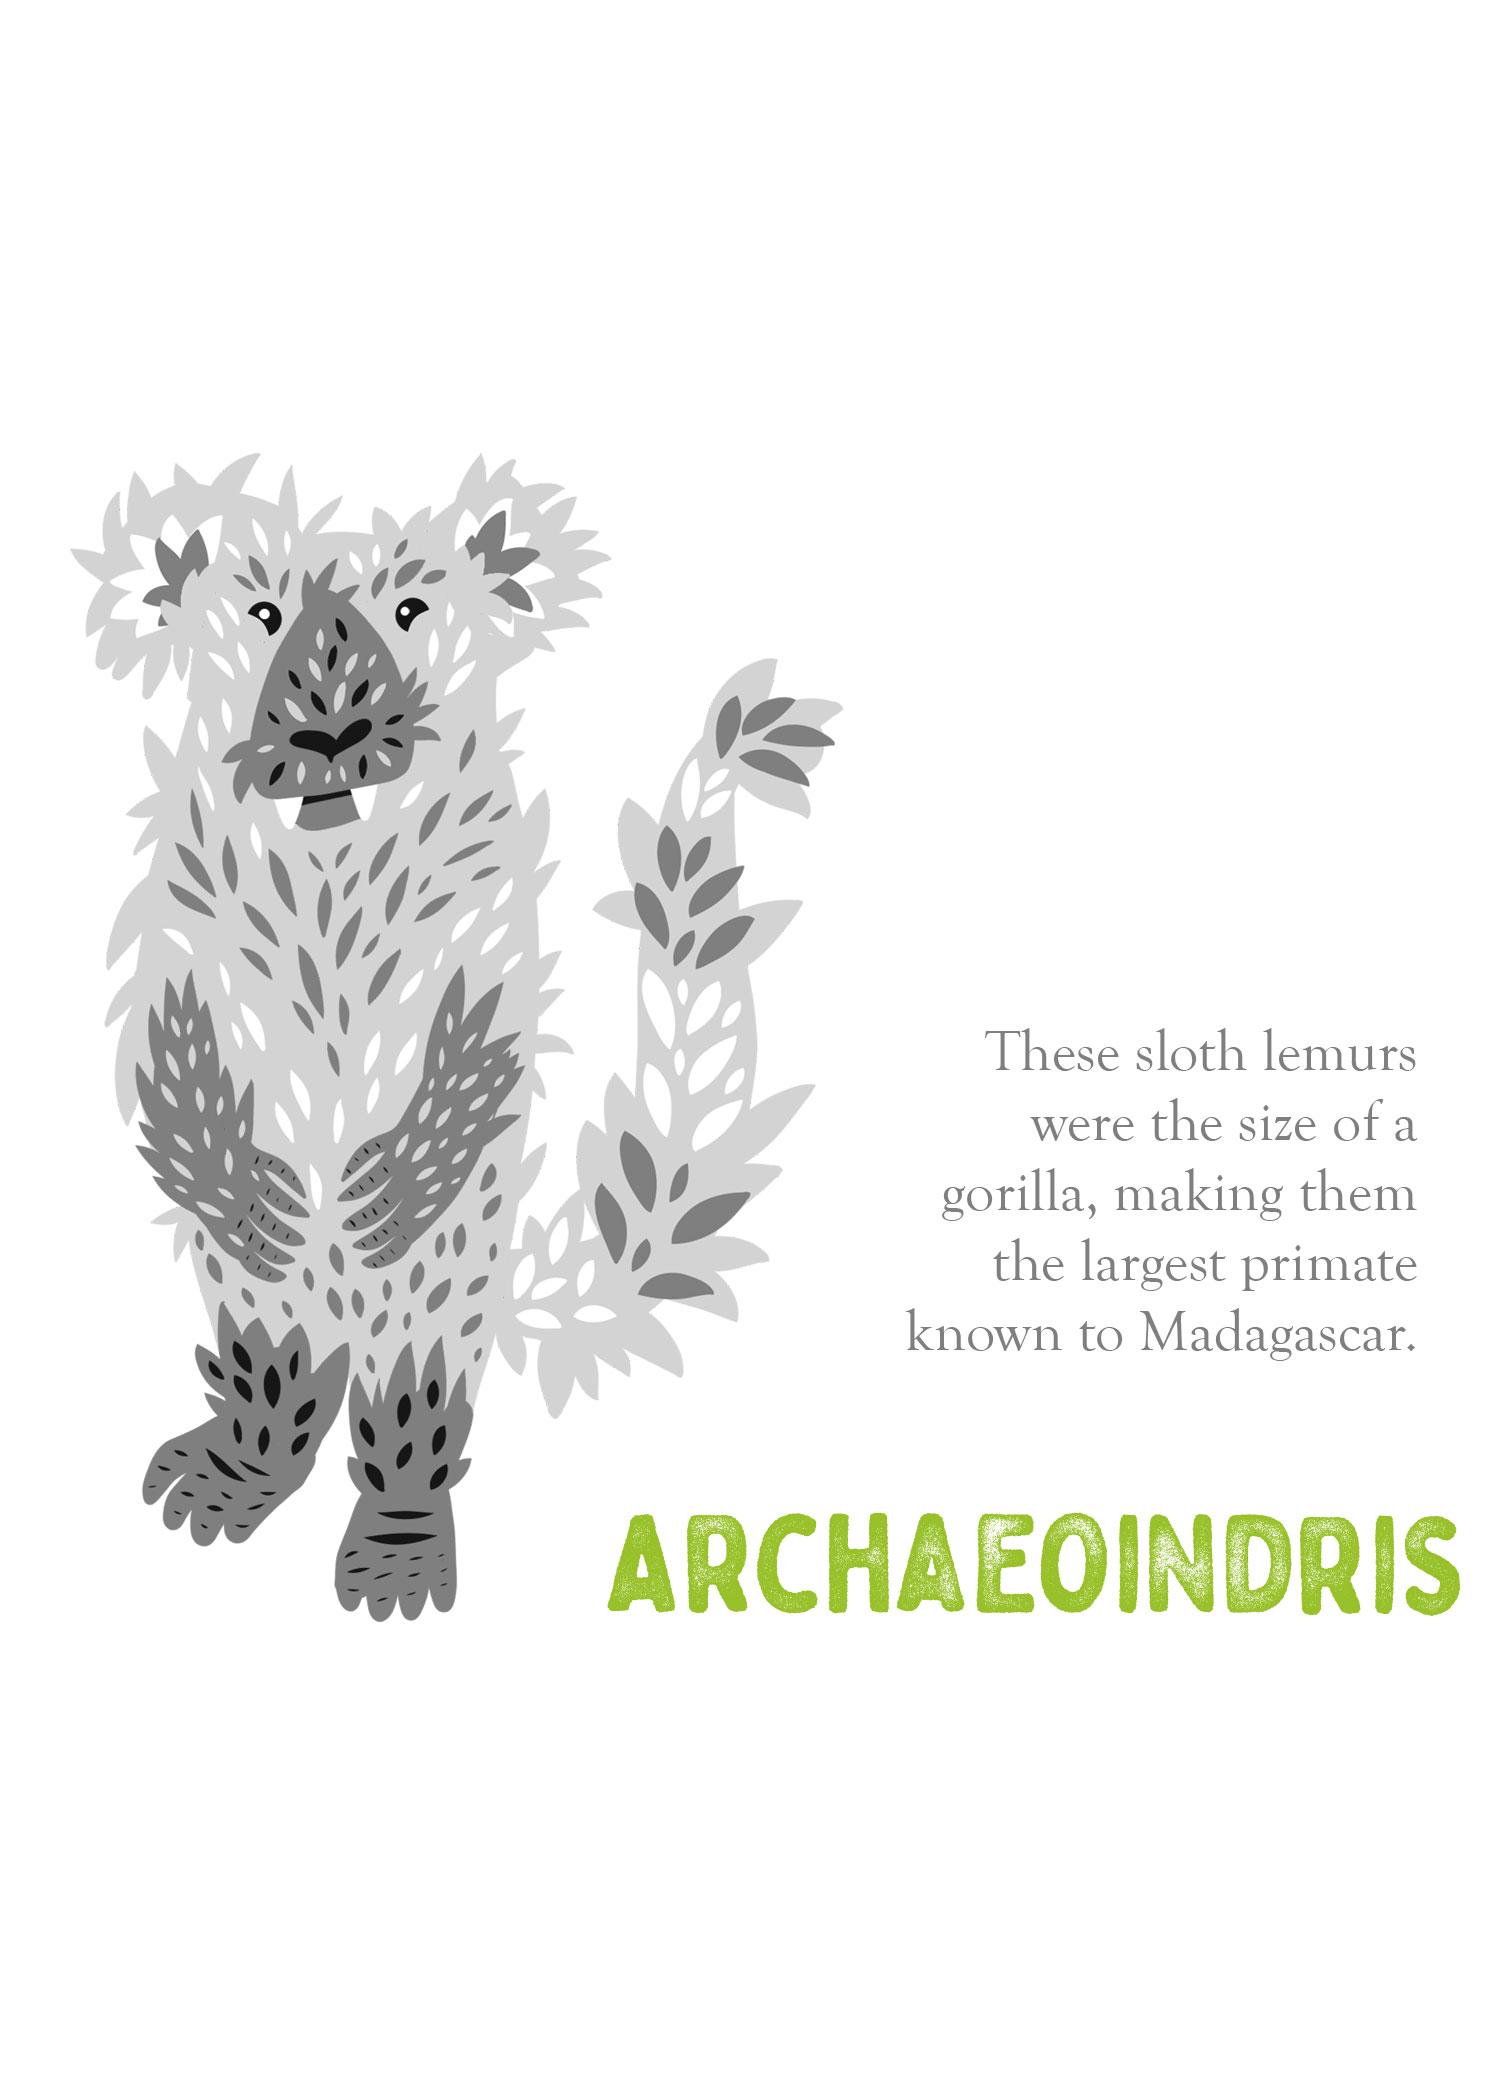 enml-archaeoindris.jpg